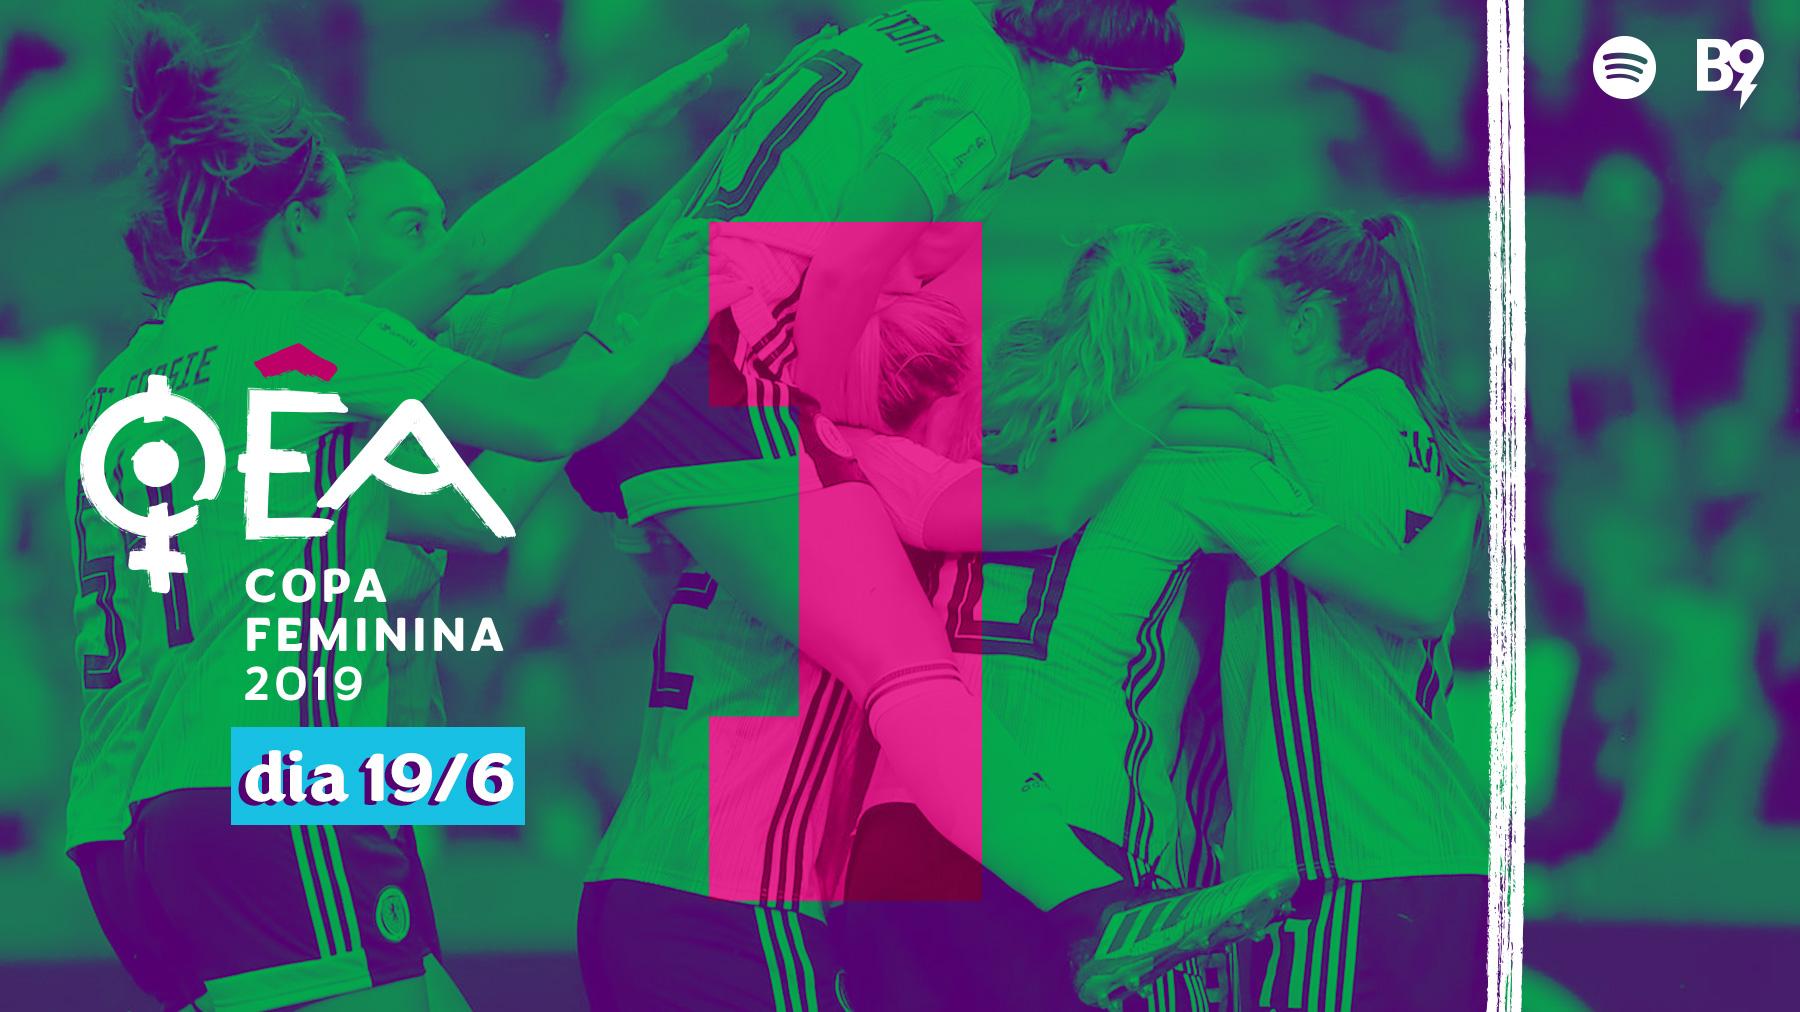 Oêa: Copa 2019 — 🇯🇵 0-2 🏴 / 🏴 3-3 🇦🇷